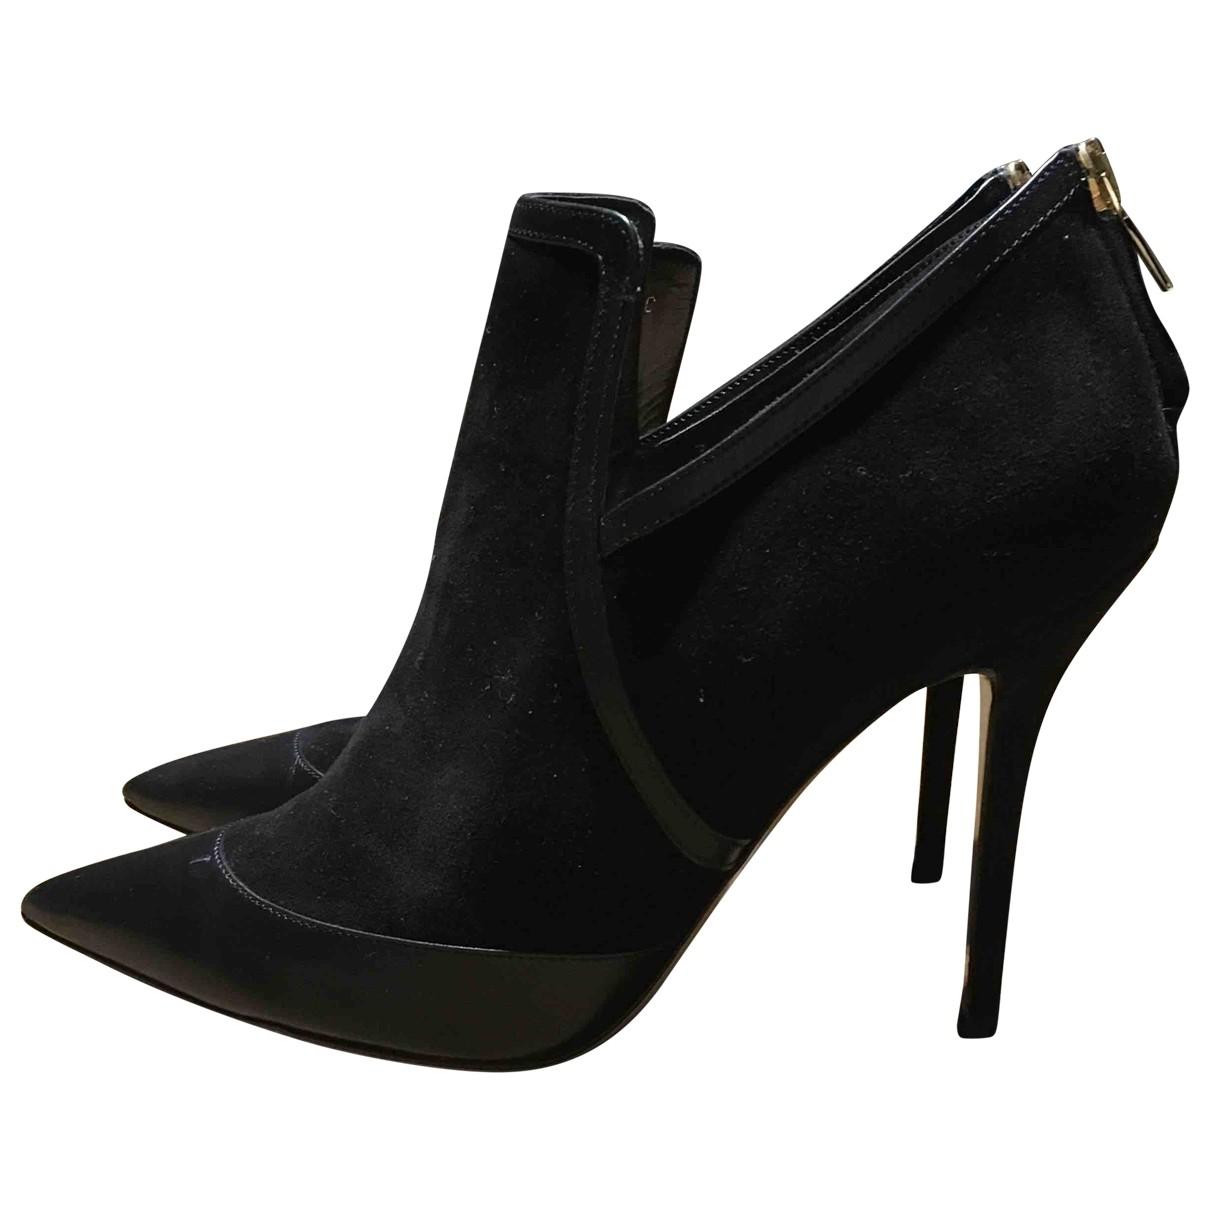 Salvatore Ferragamo \N Black Suede Heels for Women 40 EU